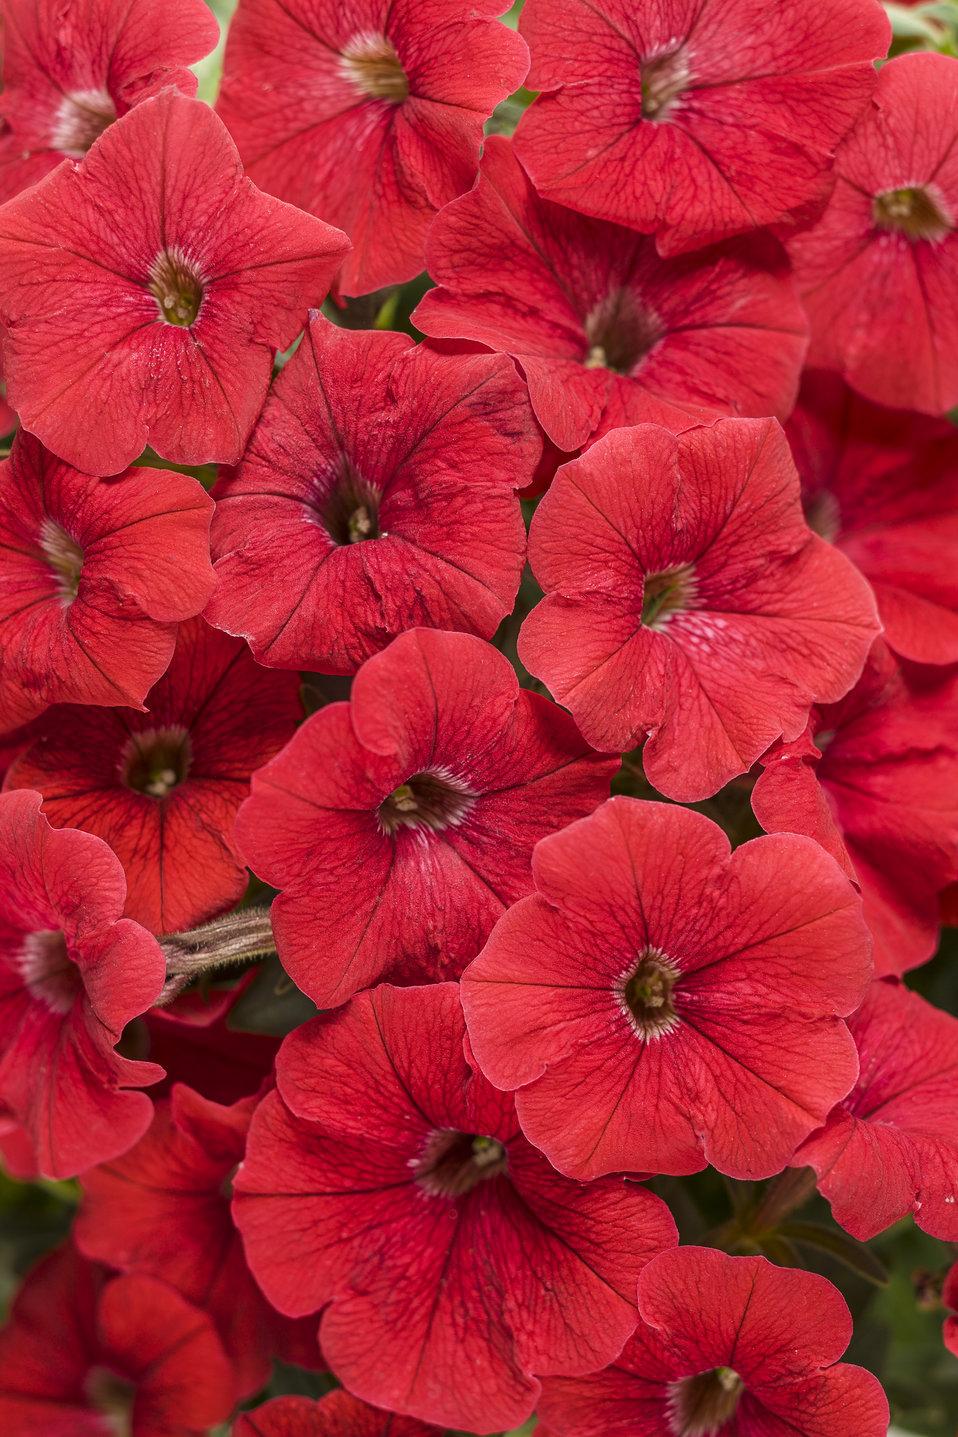 Supertunia 174 Really Red Petunia Hybrid Proven Winners